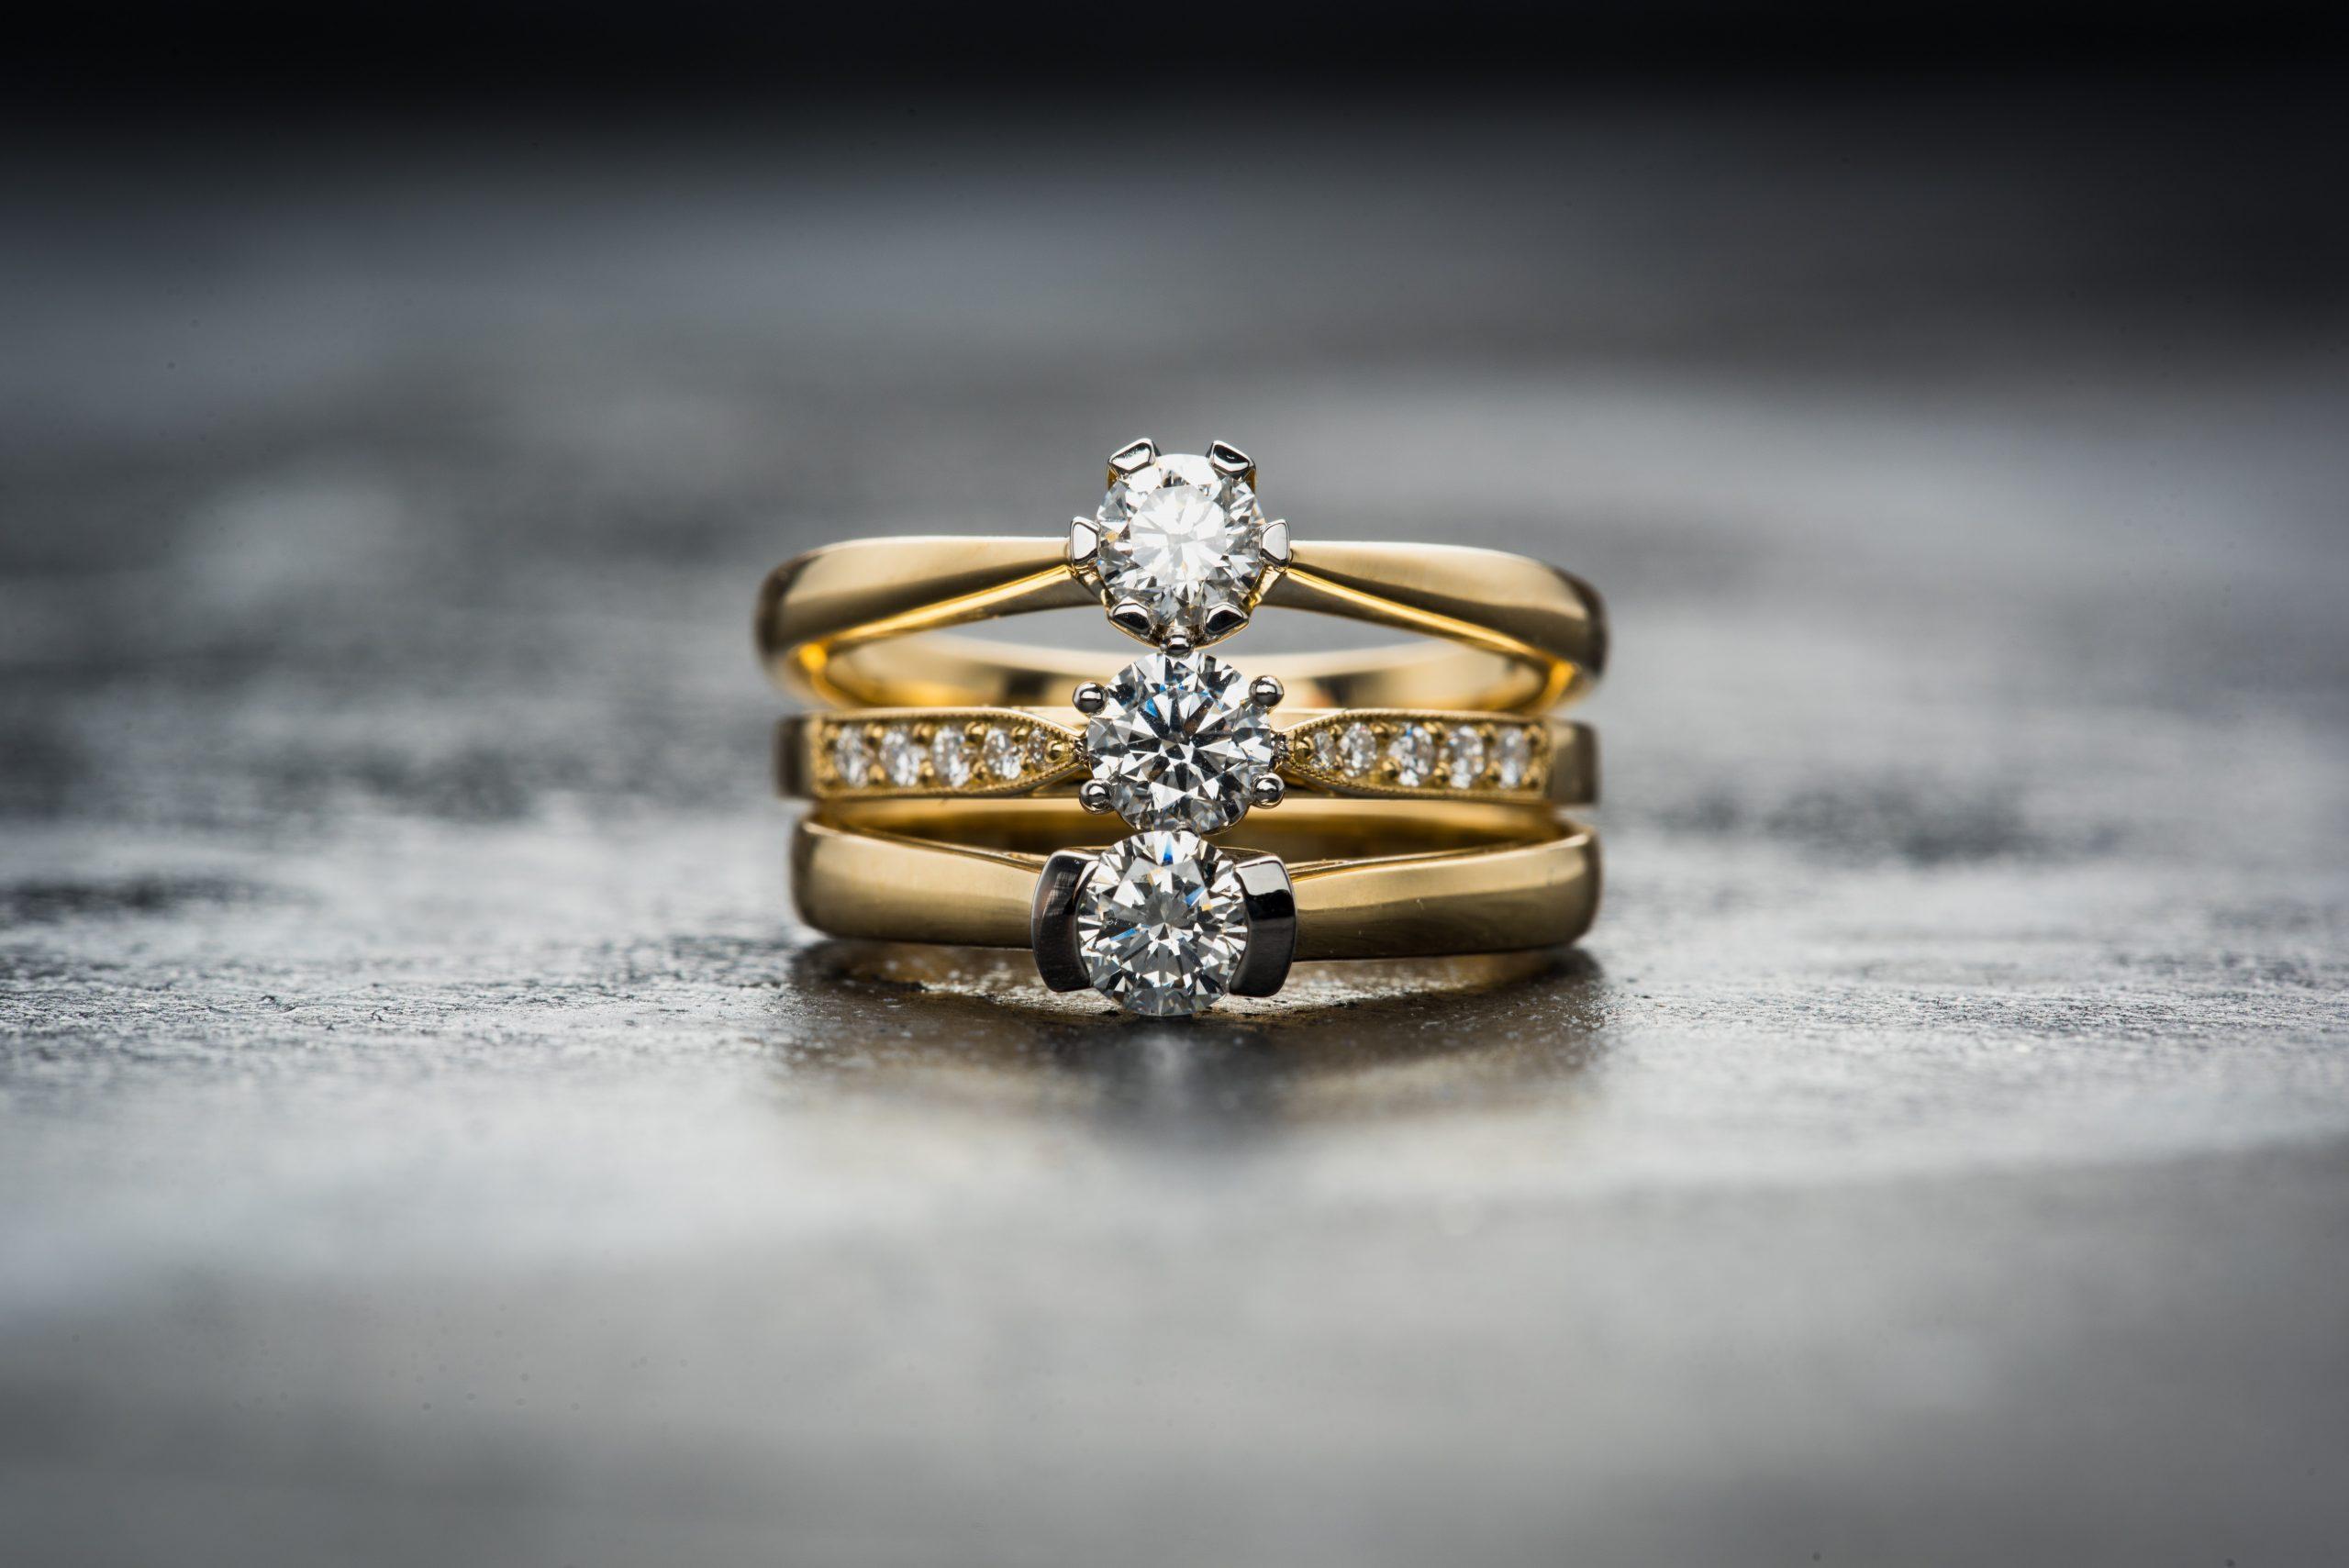 How Has the UK Jewellery Market Coped Through Coronavirus?